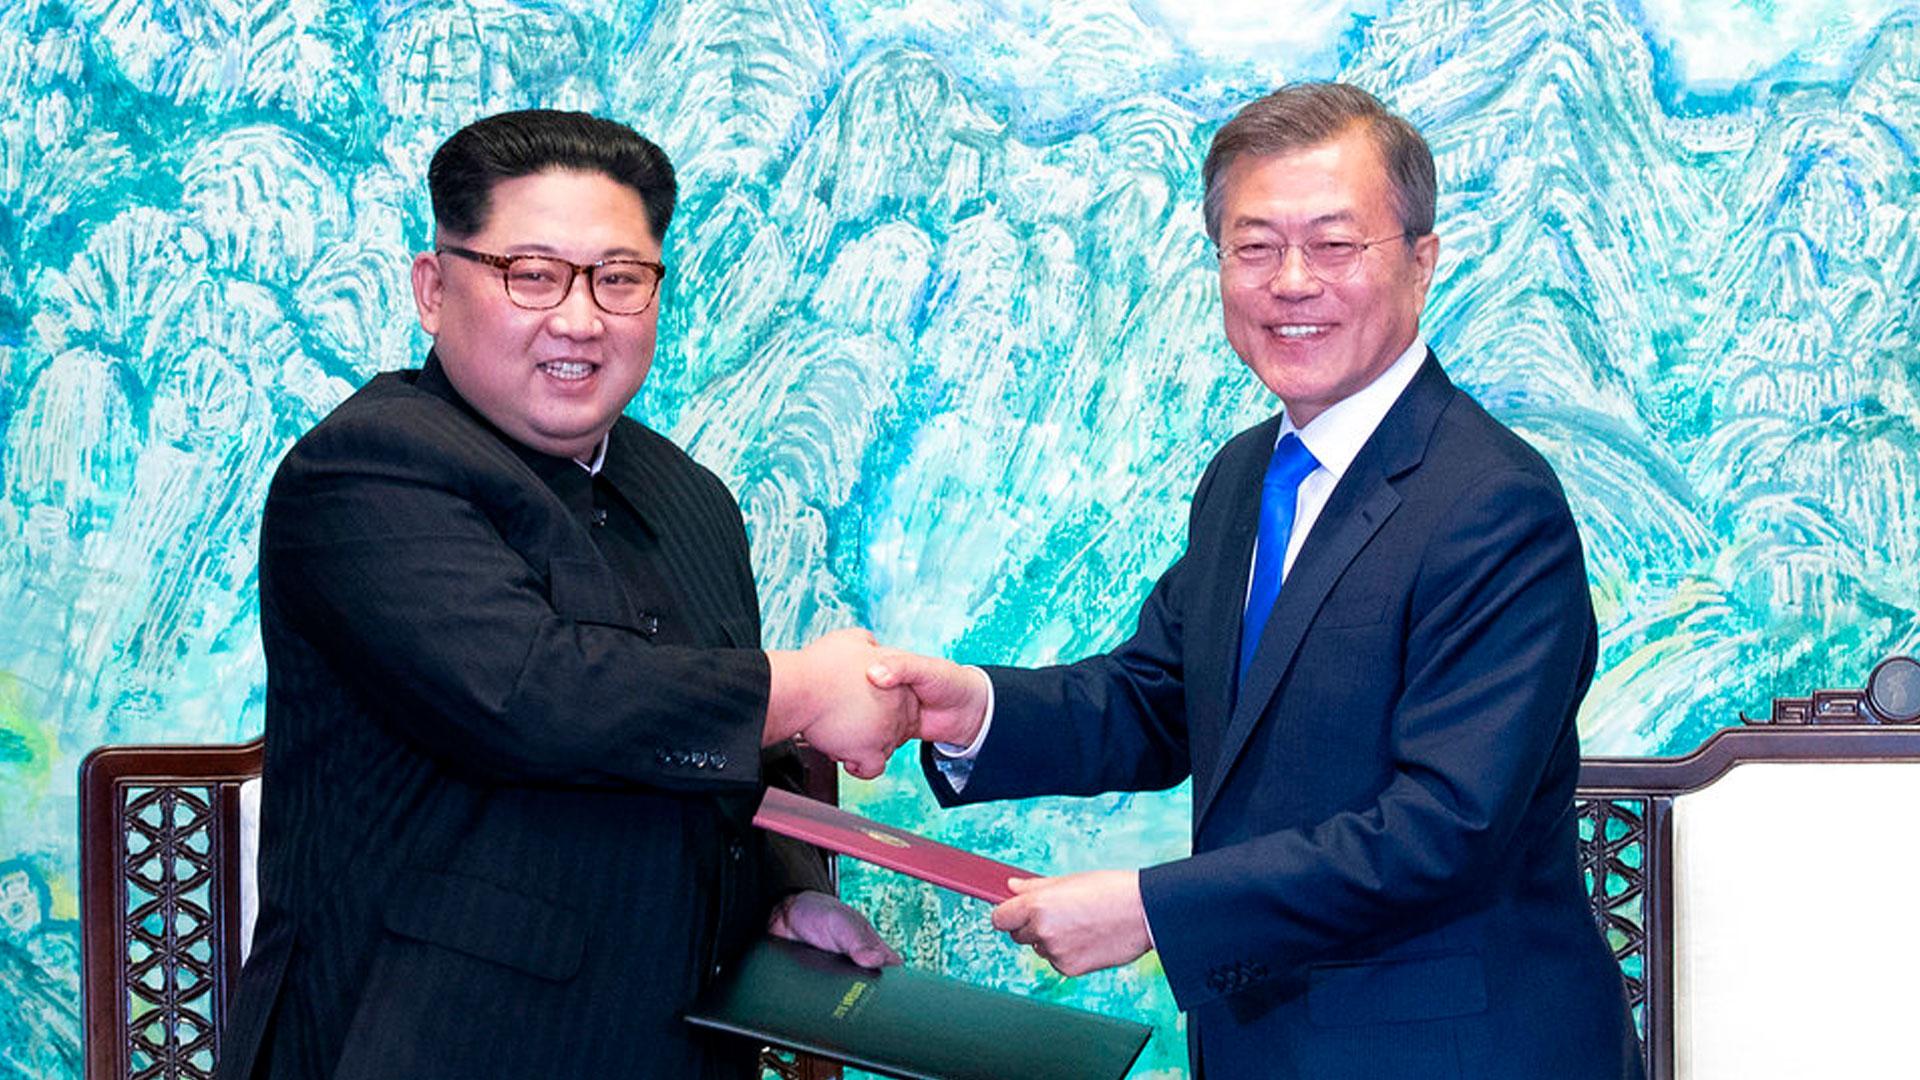 north-korea-south-korea_1525075007622.jpg